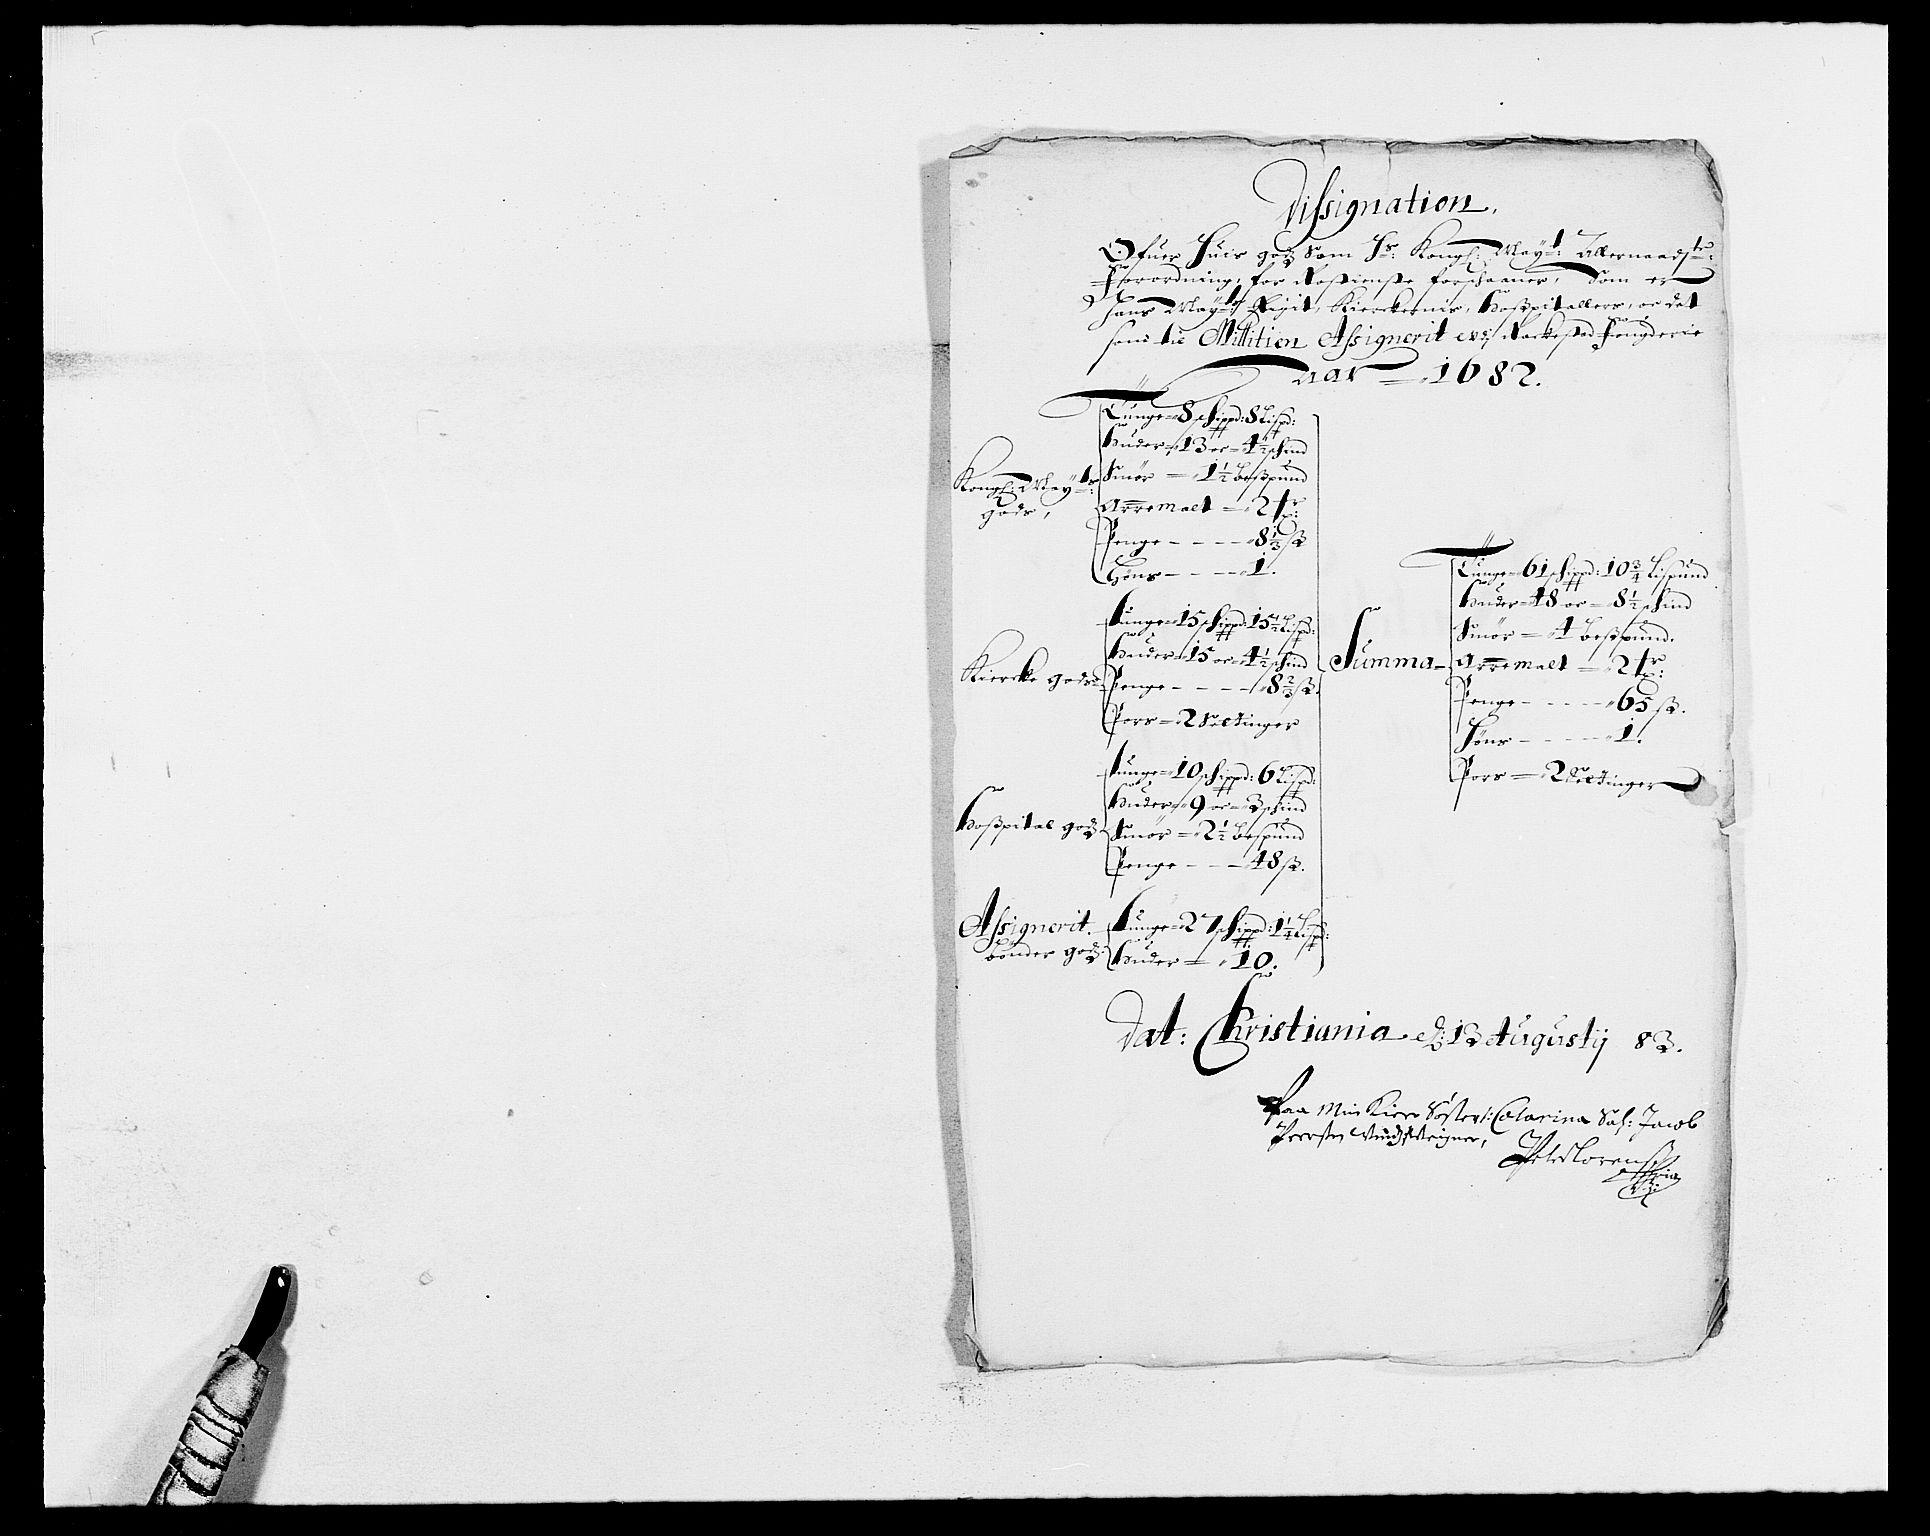 RA, Rentekammeret inntil 1814, Reviderte regnskaper, Fogderegnskap, R05/L0273: Fogderegnskap Rakkestad, 1682, s. 165